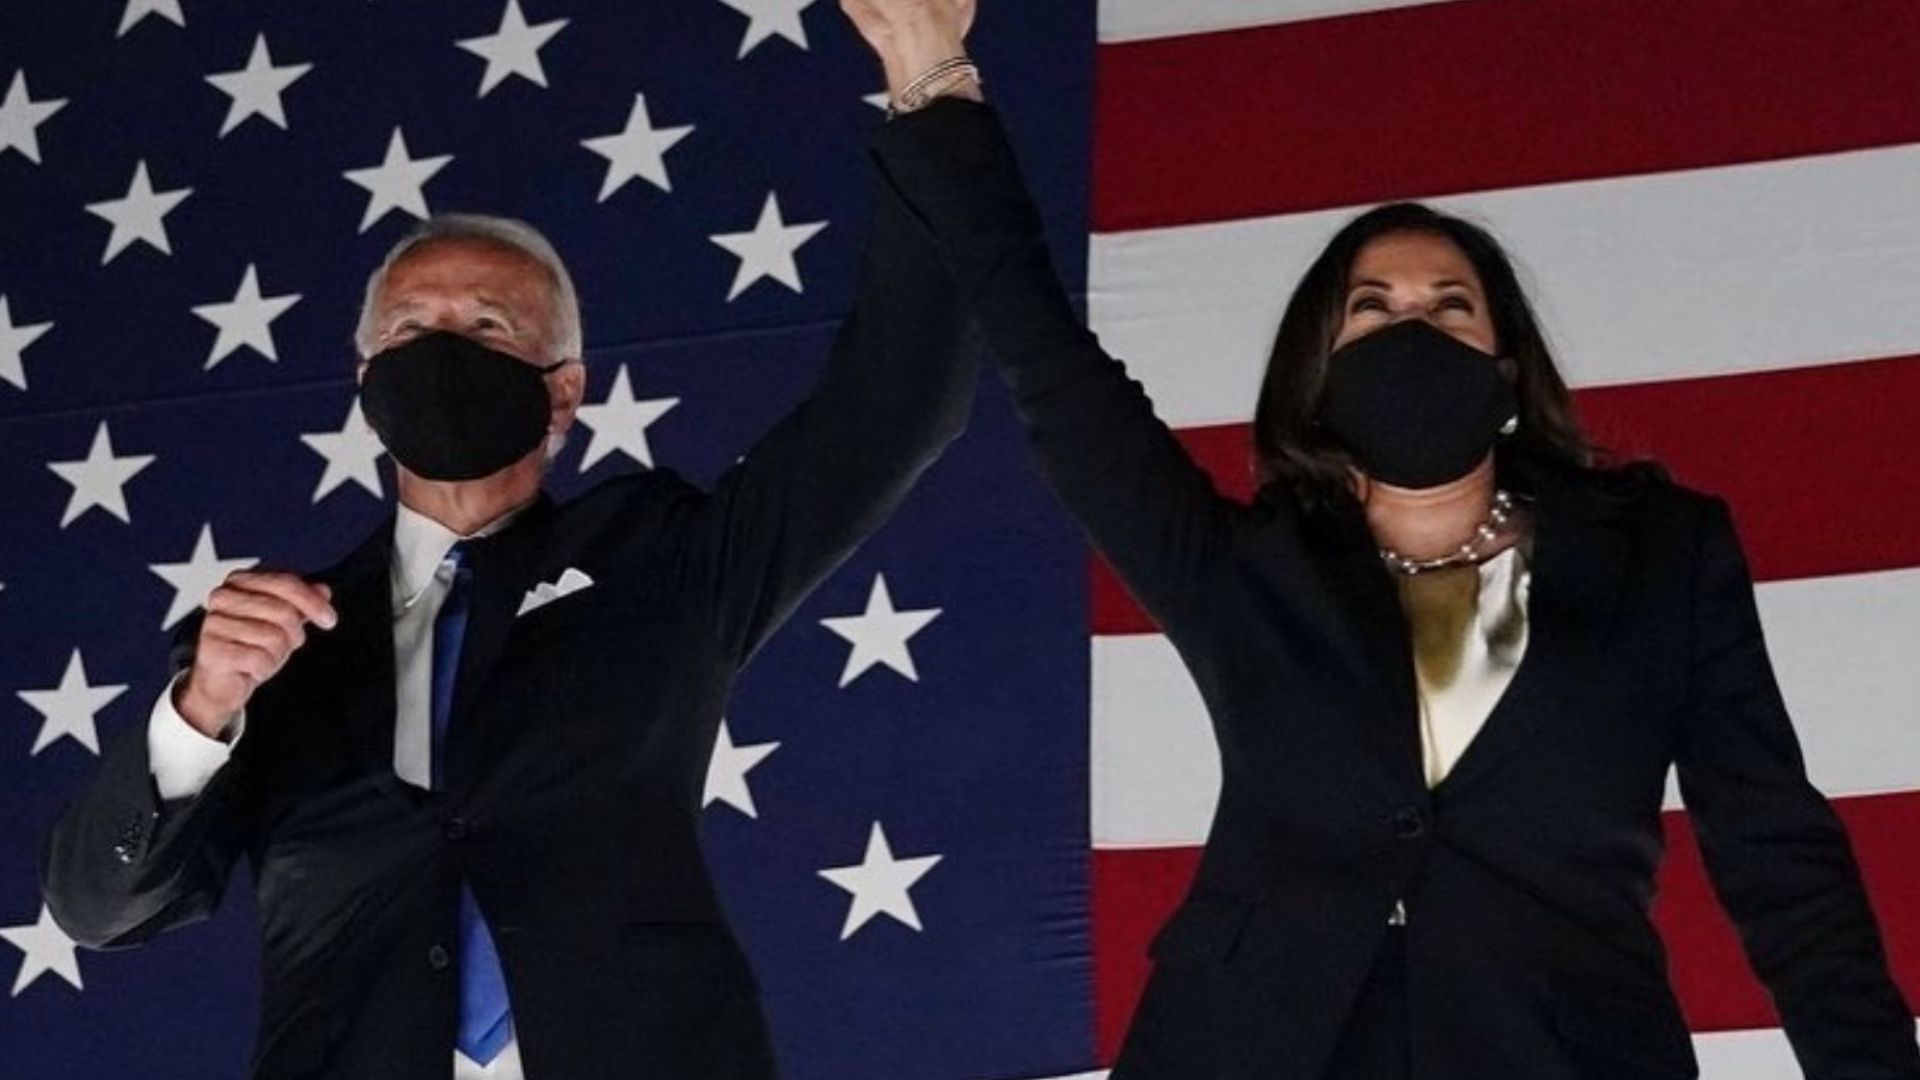 Joe Biden aceptó la candidatura demócrata a la presidencia de EEUU